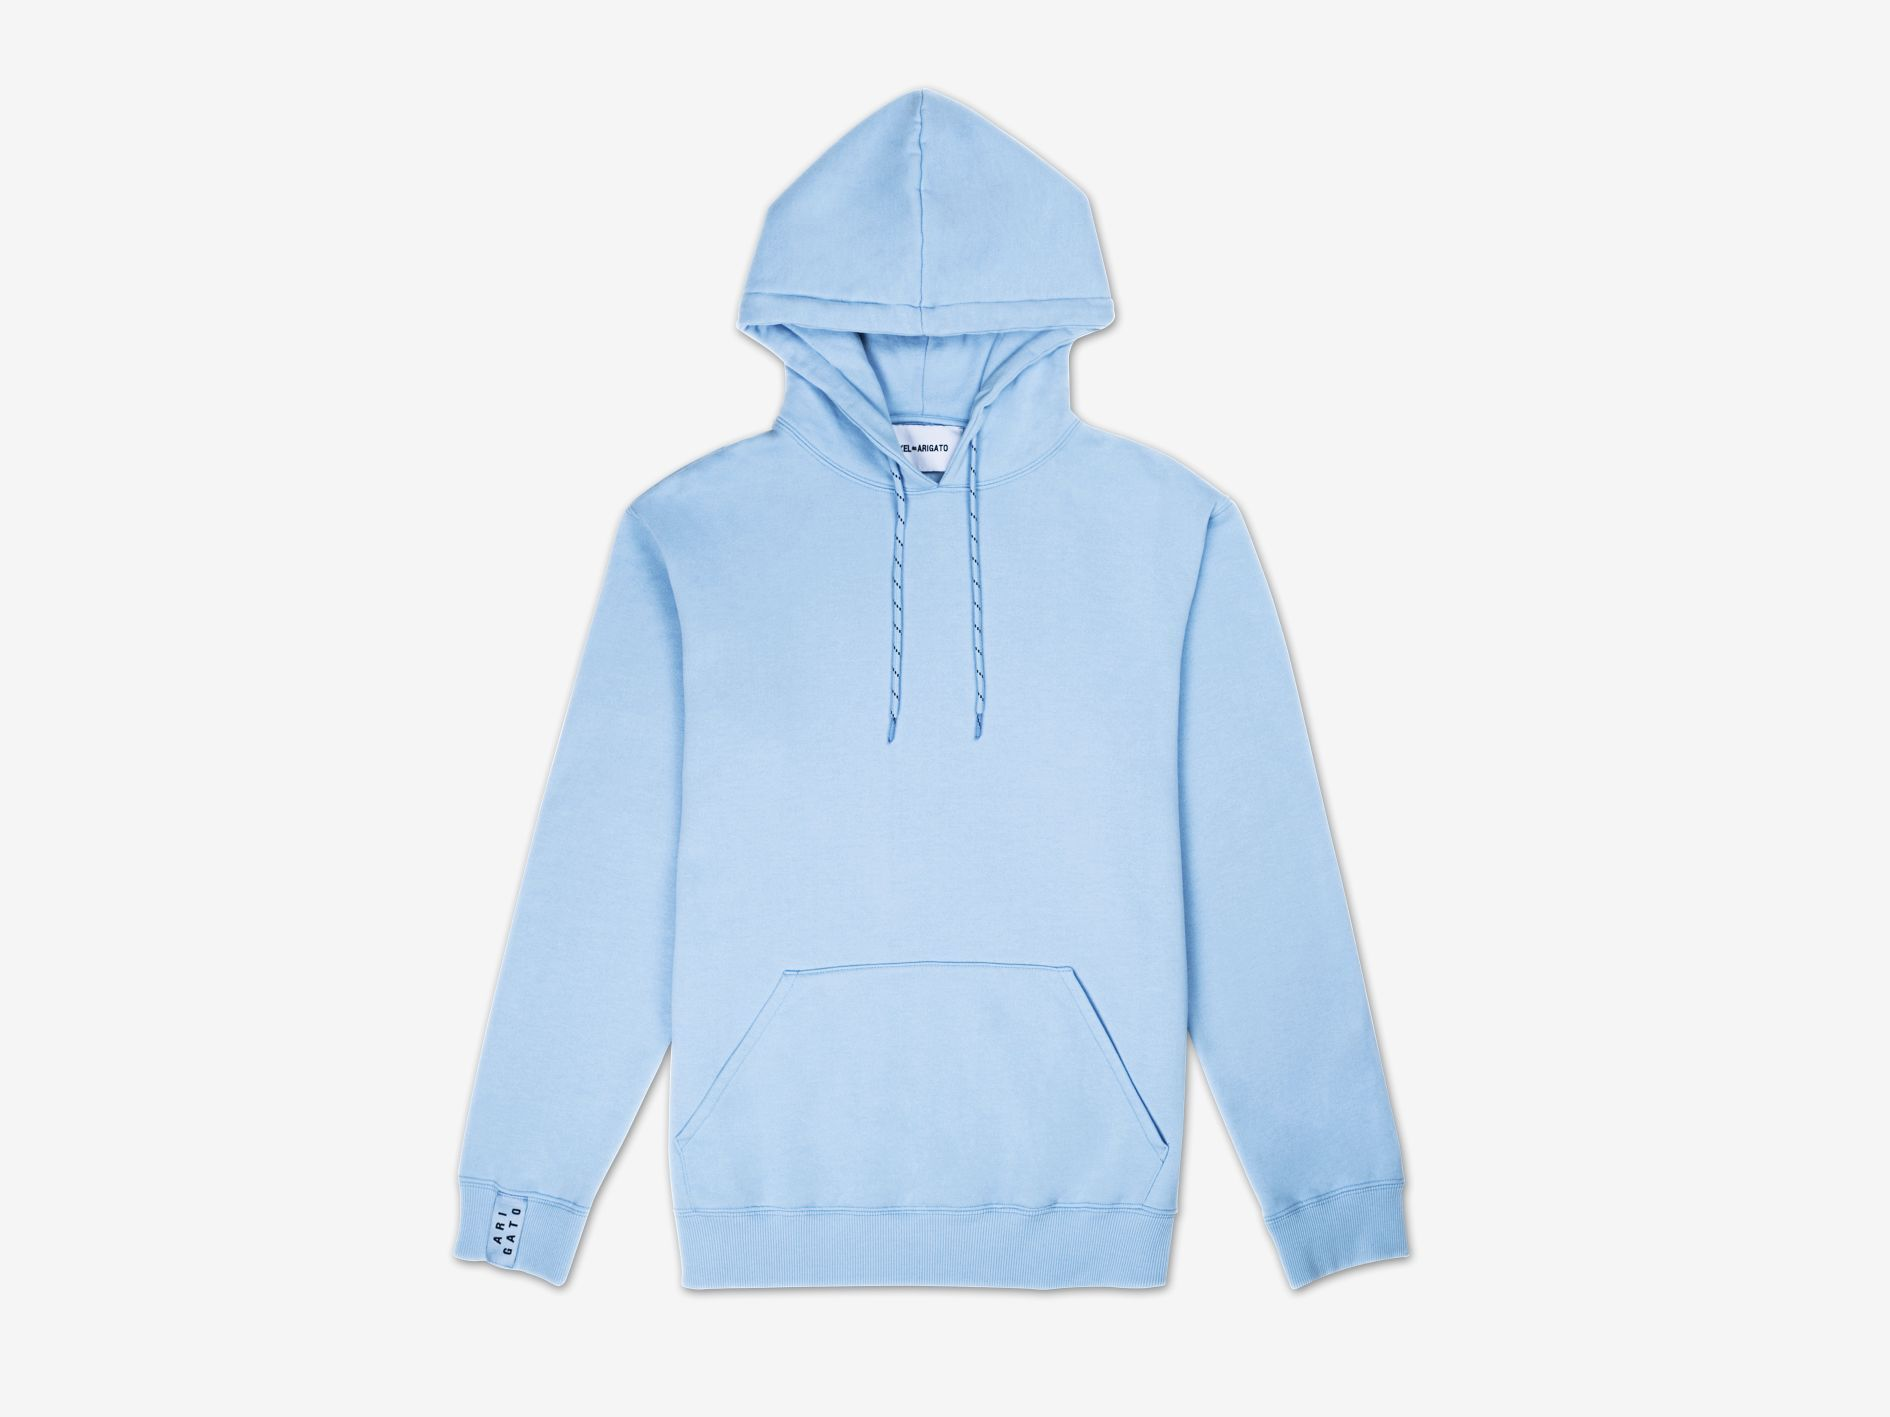 eeb8e1338 AXEL ARIGATO - Essencu Hoodie Light Blue Cotton | À La Mode in 2019 ...